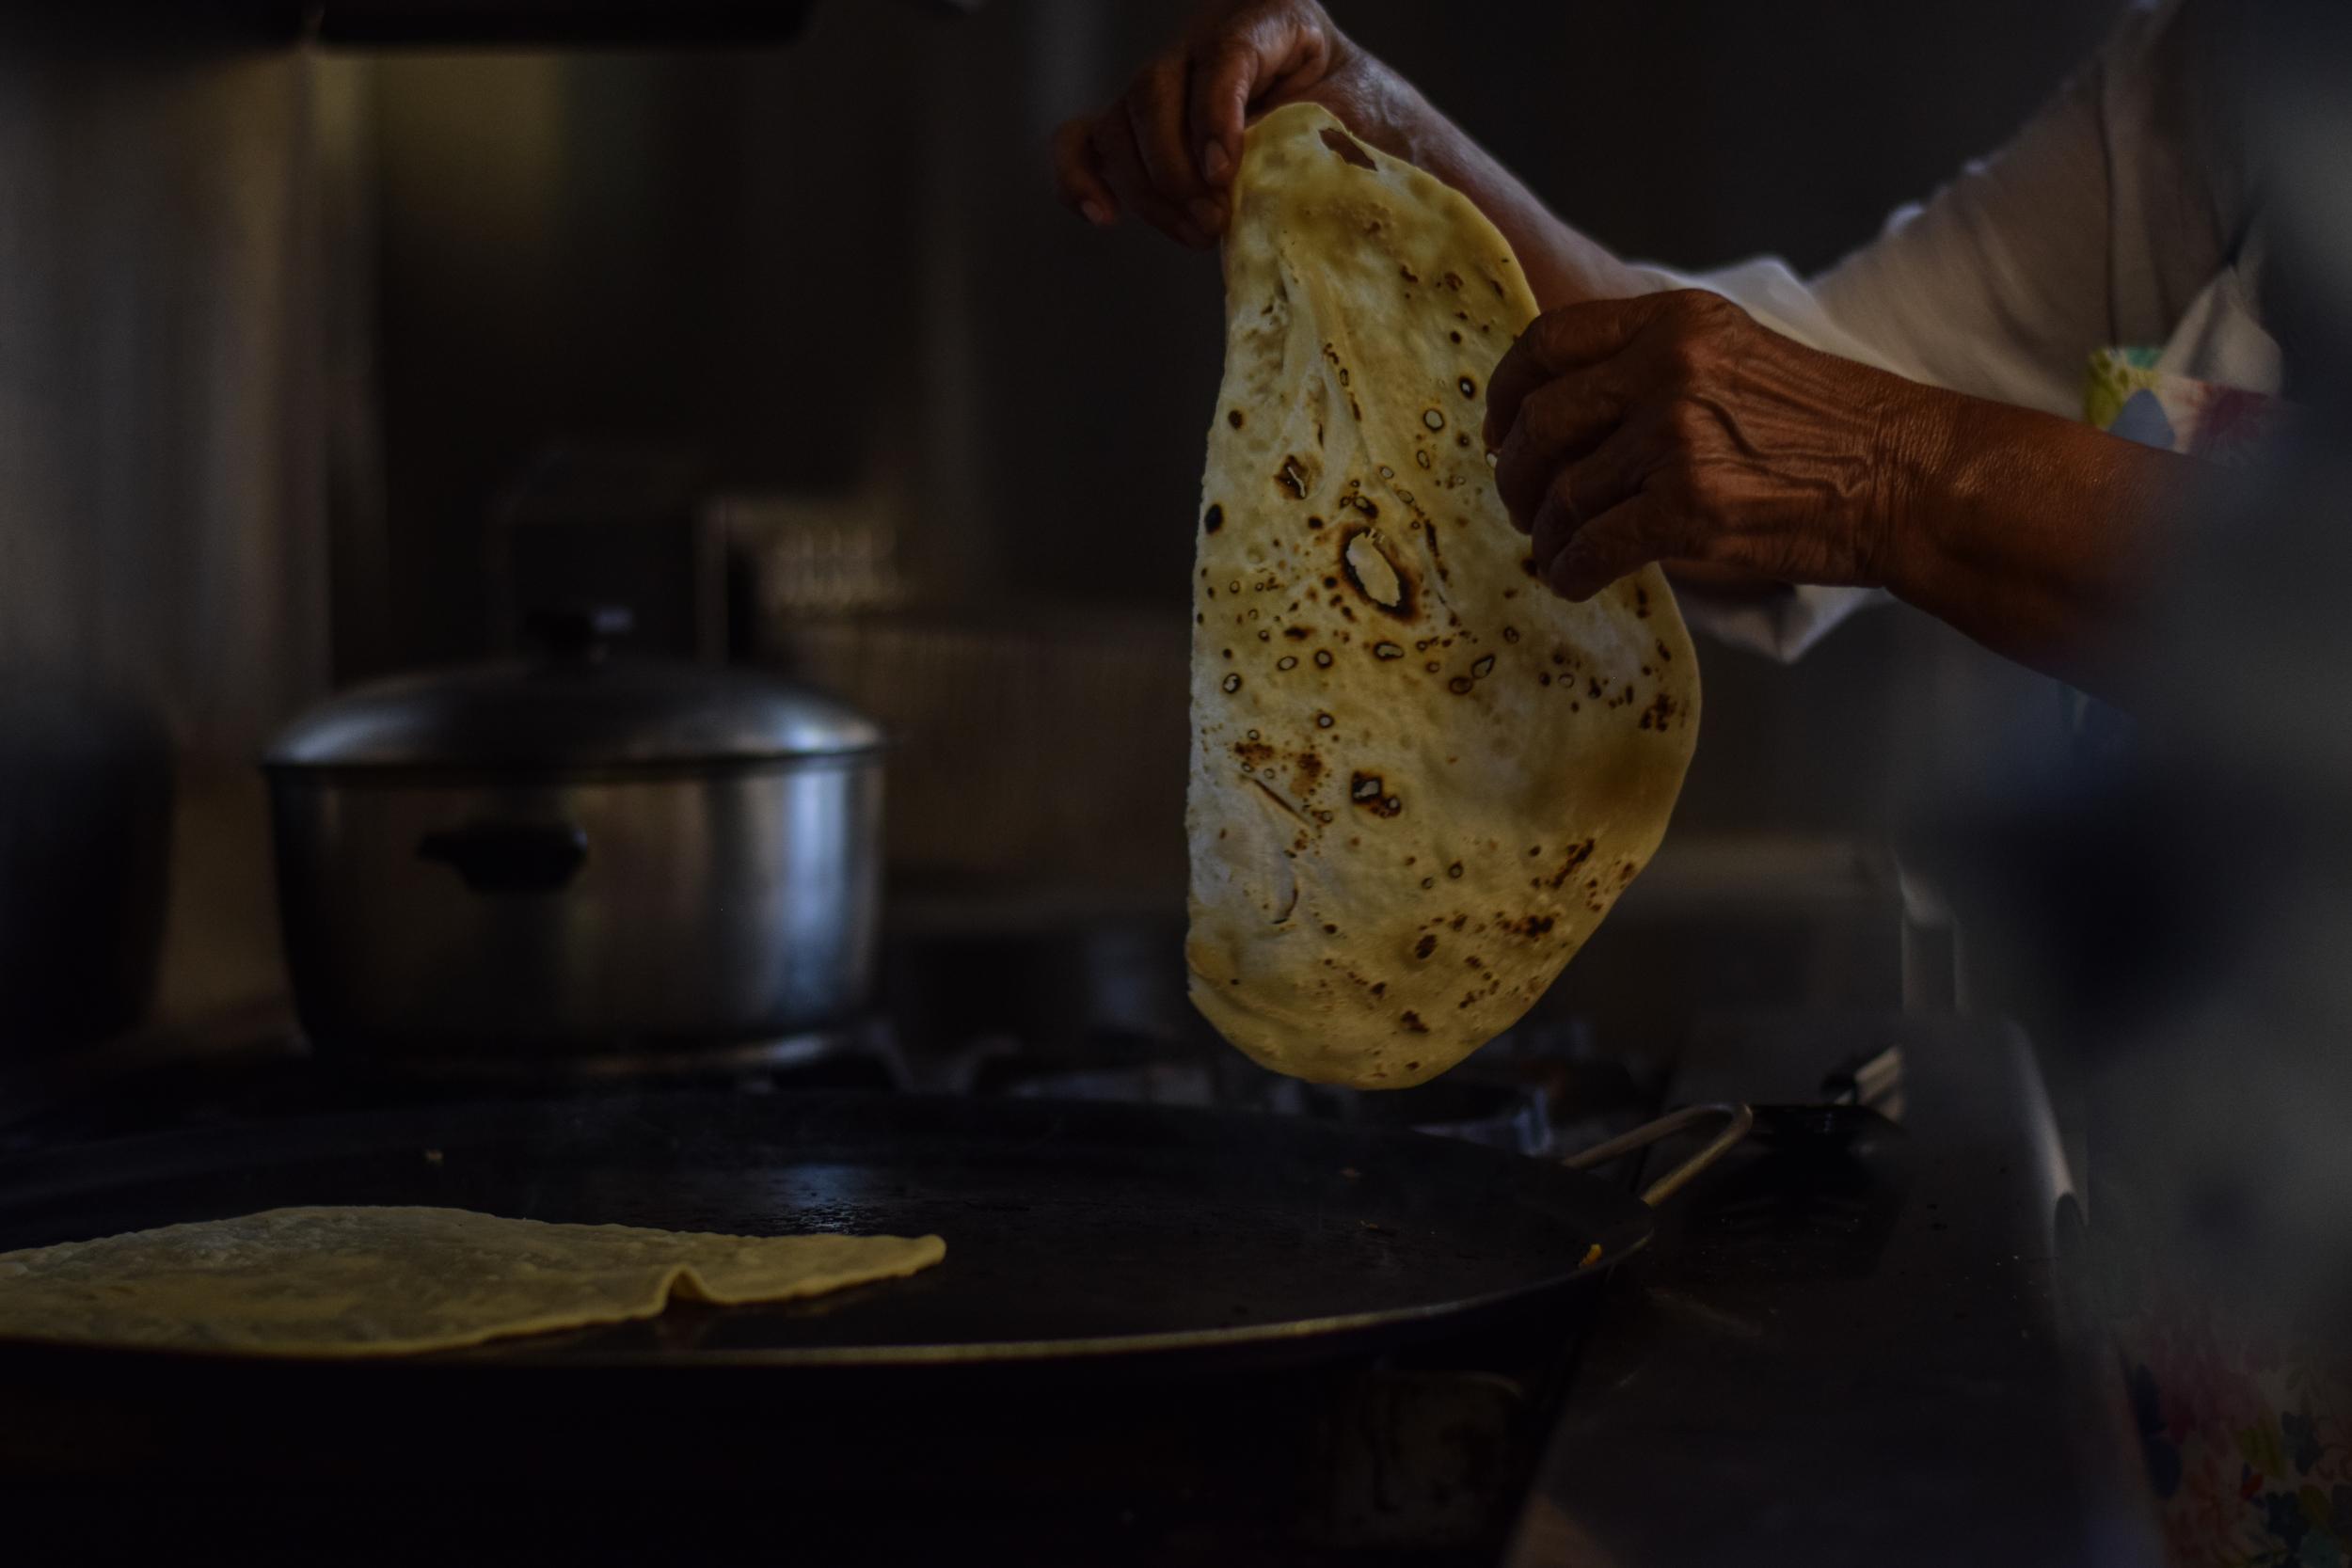 Making homemade tortillas